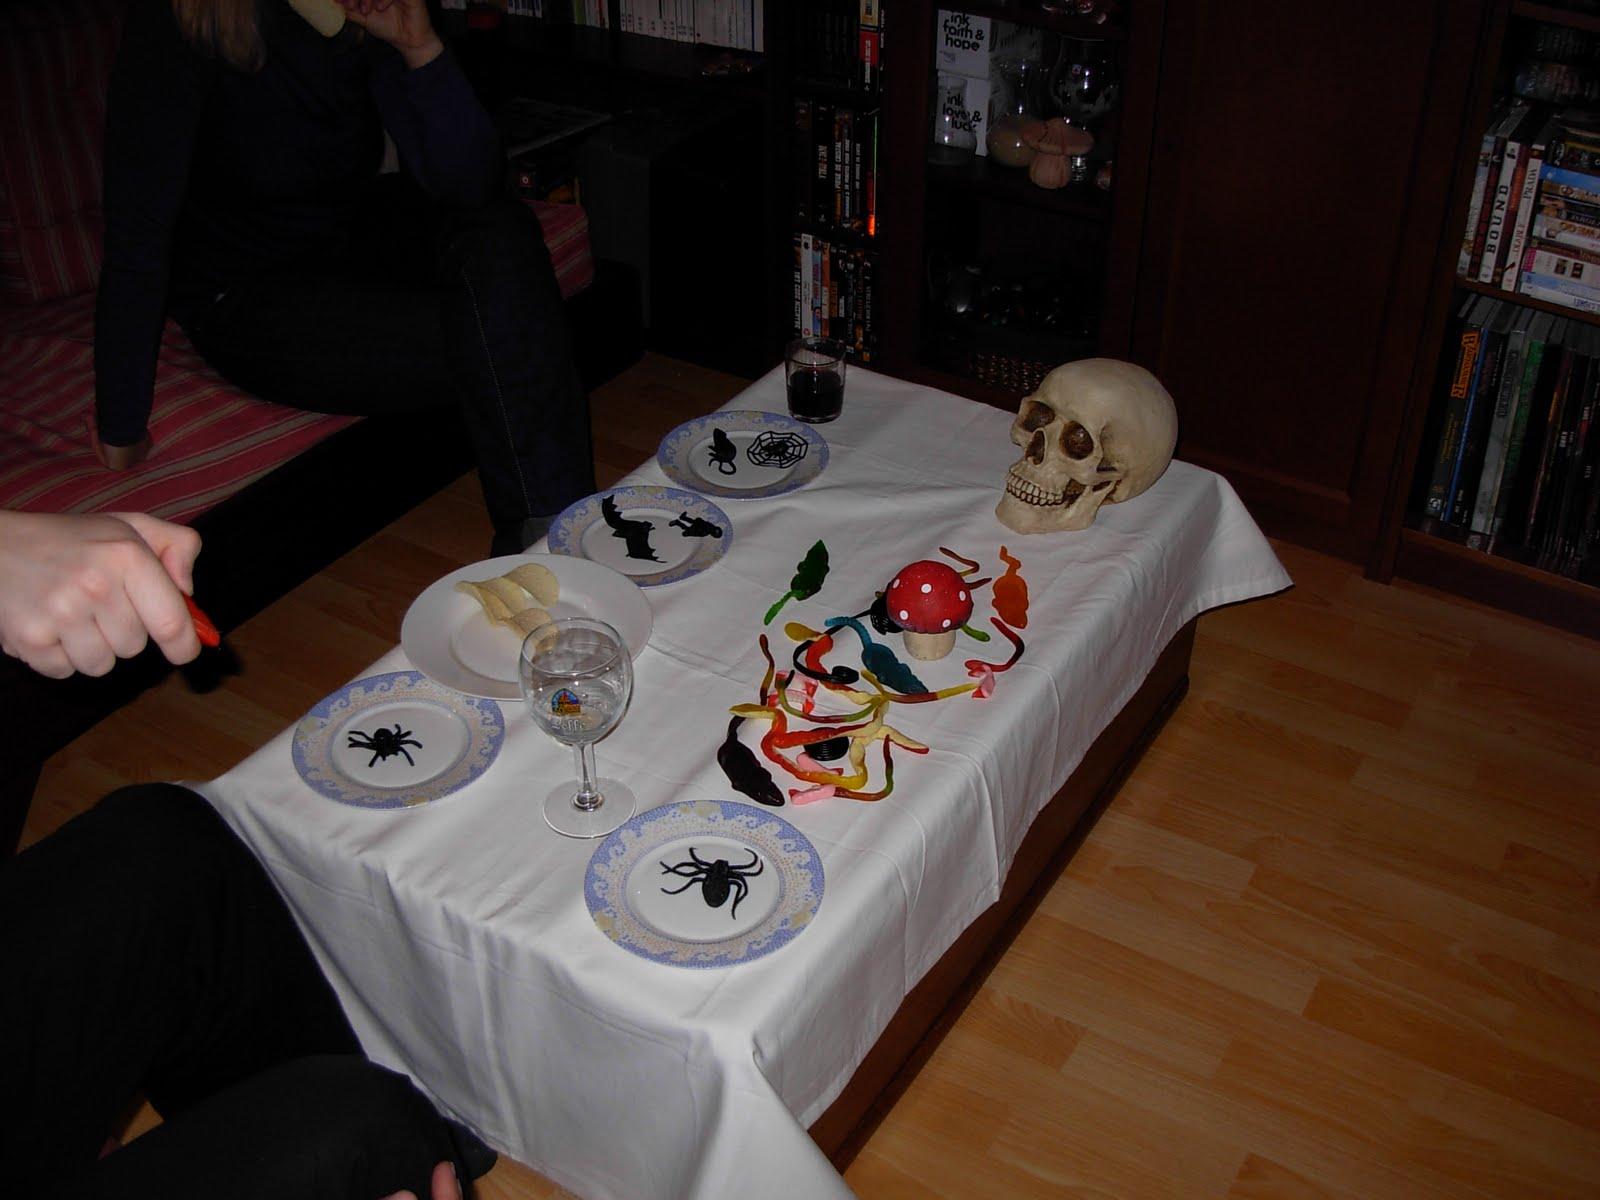 aventure onirique repas d 39 halloween avant l 39 heure. Black Bedroom Furniture Sets. Home Design Ideas